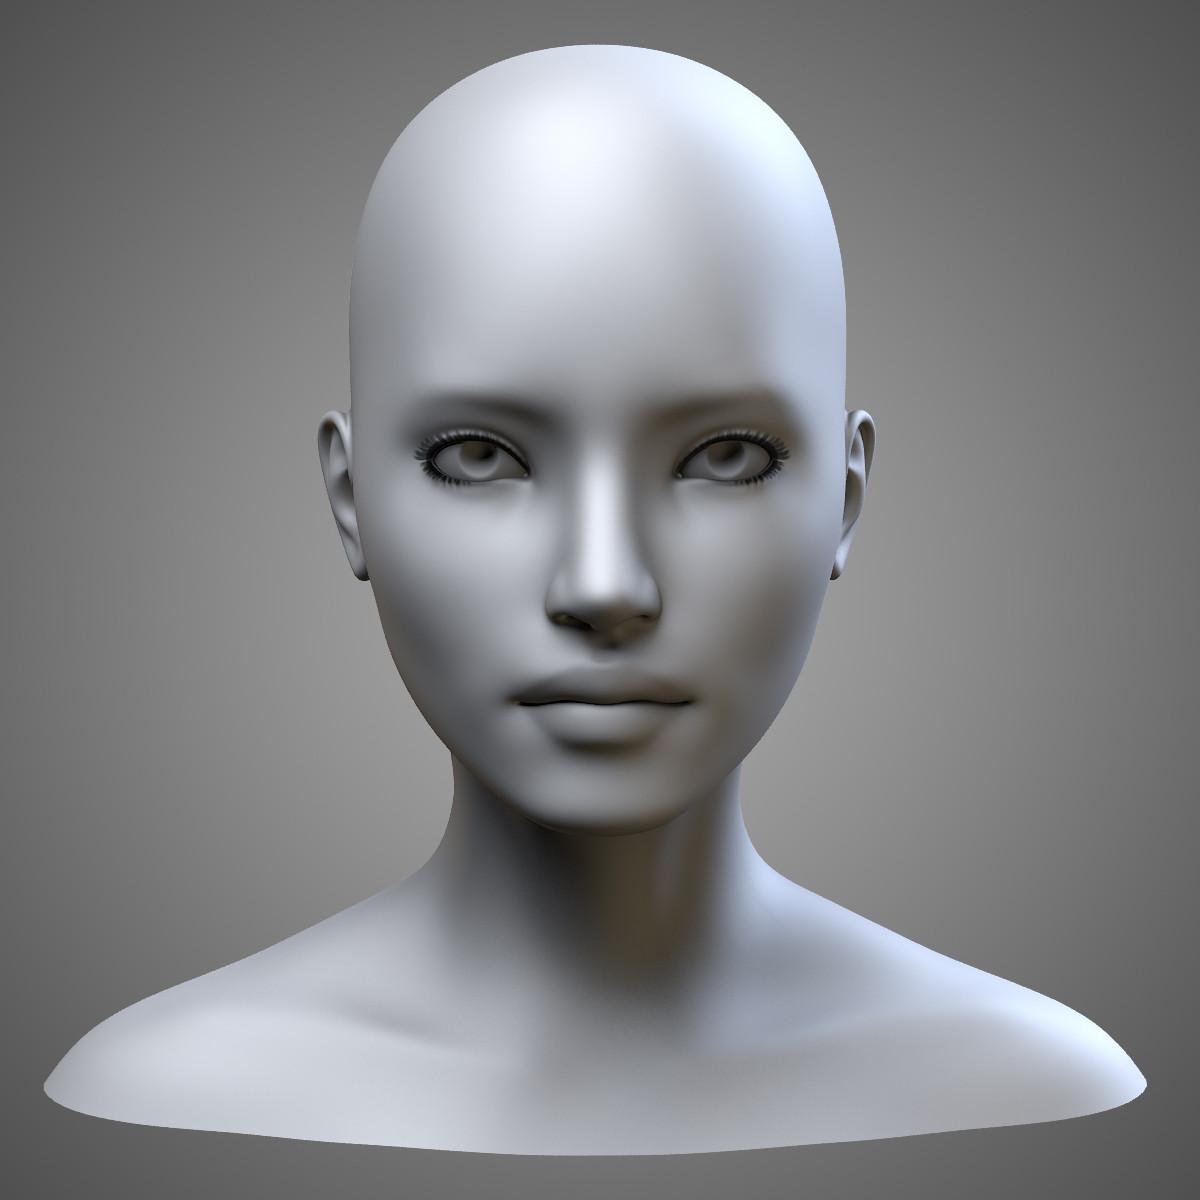 Female head 3d model for 3ds max face modeling